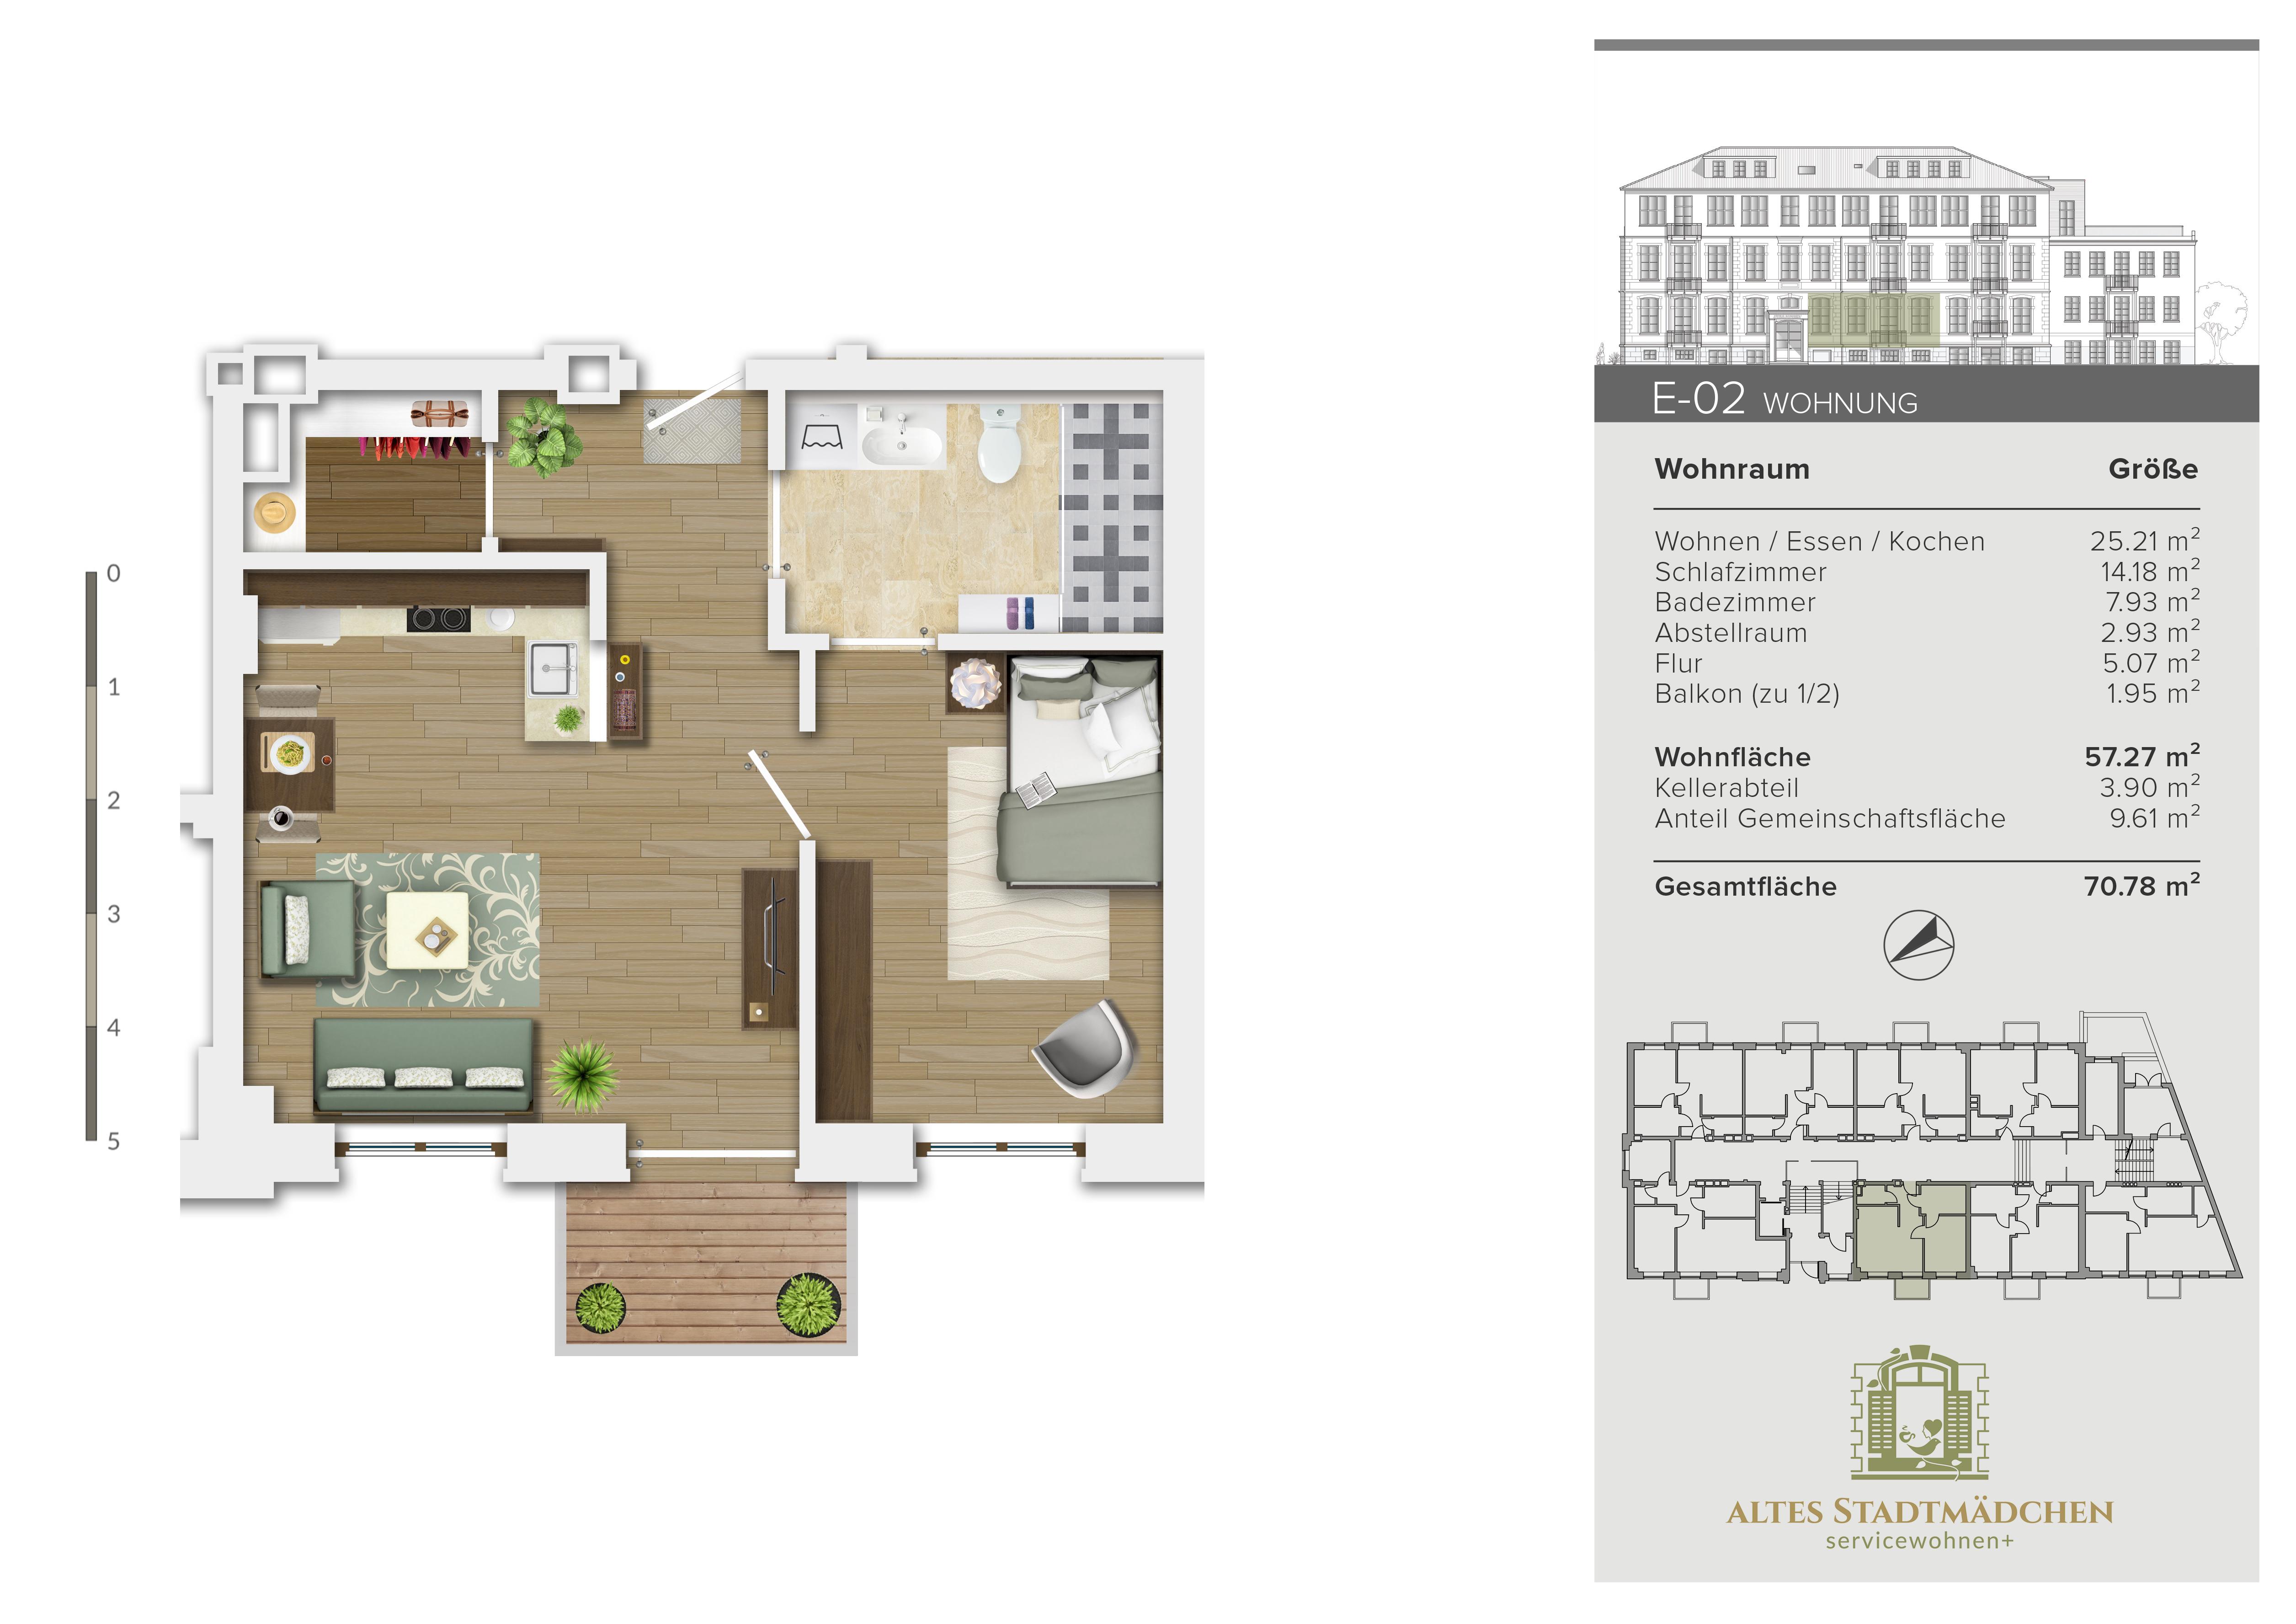 Wohnung E-02